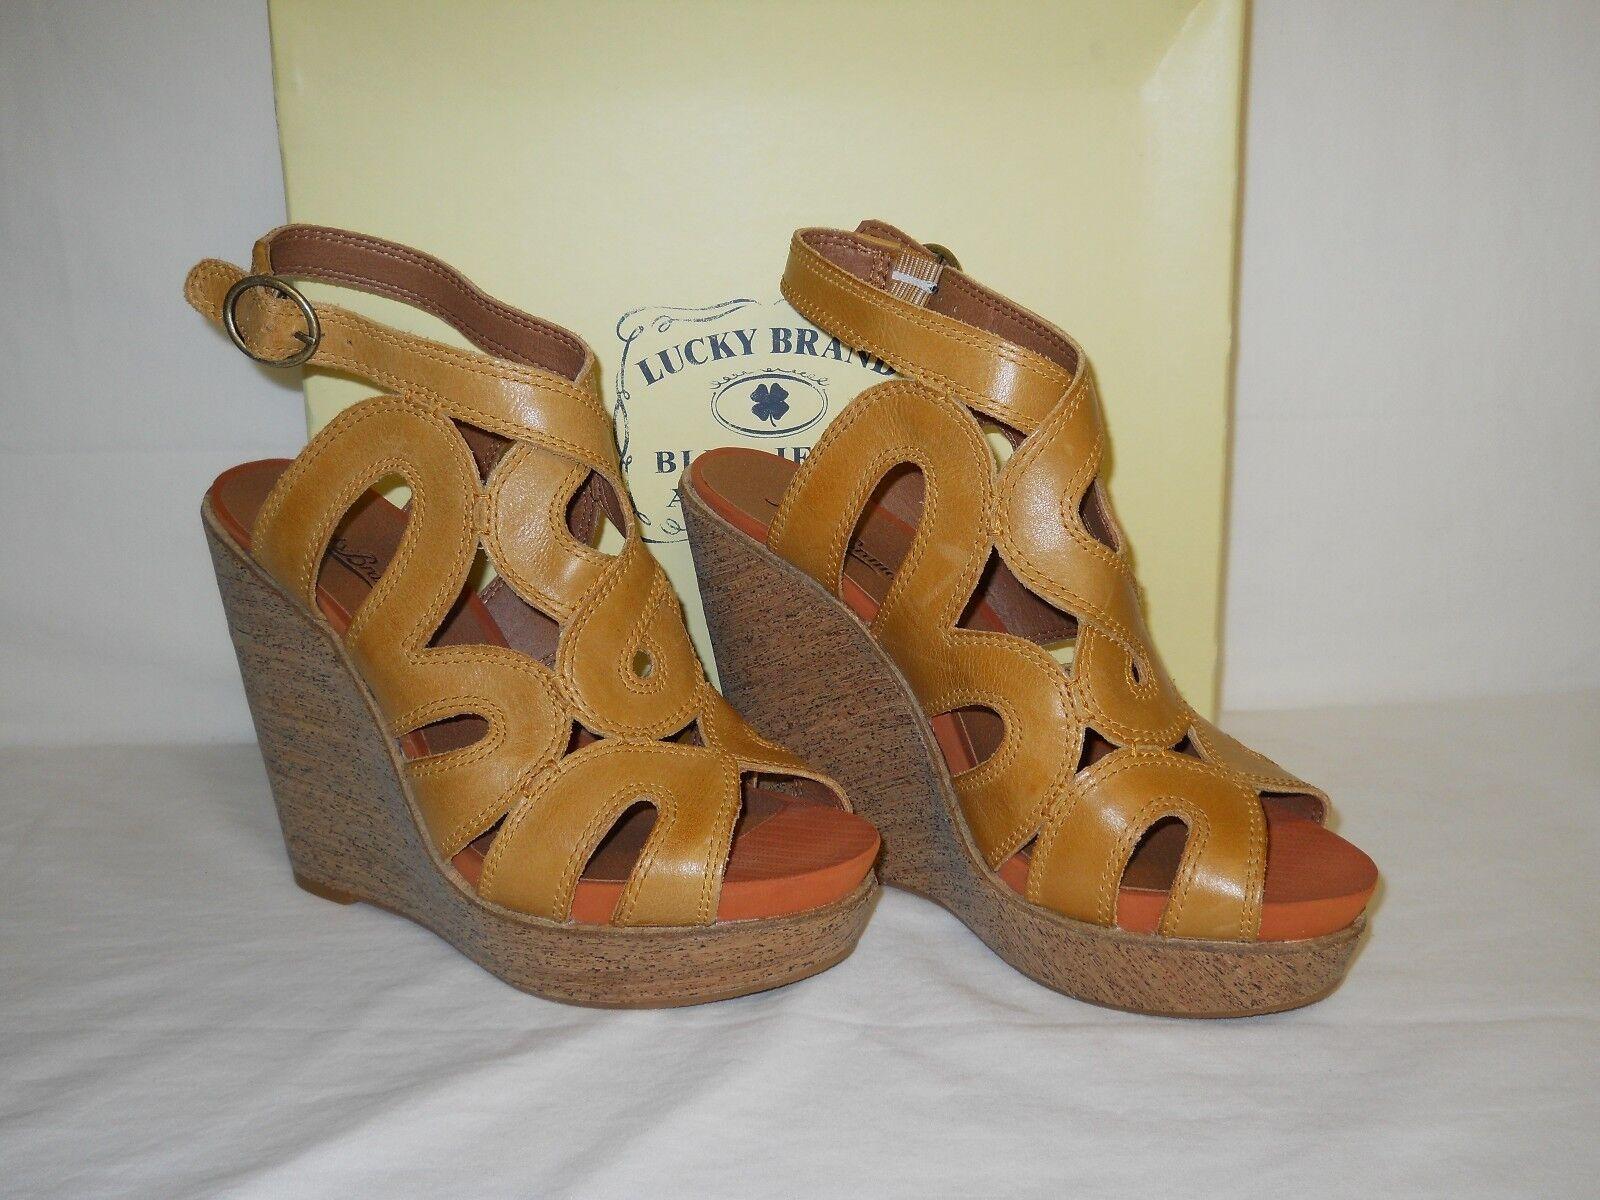 Lucky Brand New Damenschuhe Penrose Penrose Penrose Wedge Heels 9.5 M Schuhes NWB 1687ee